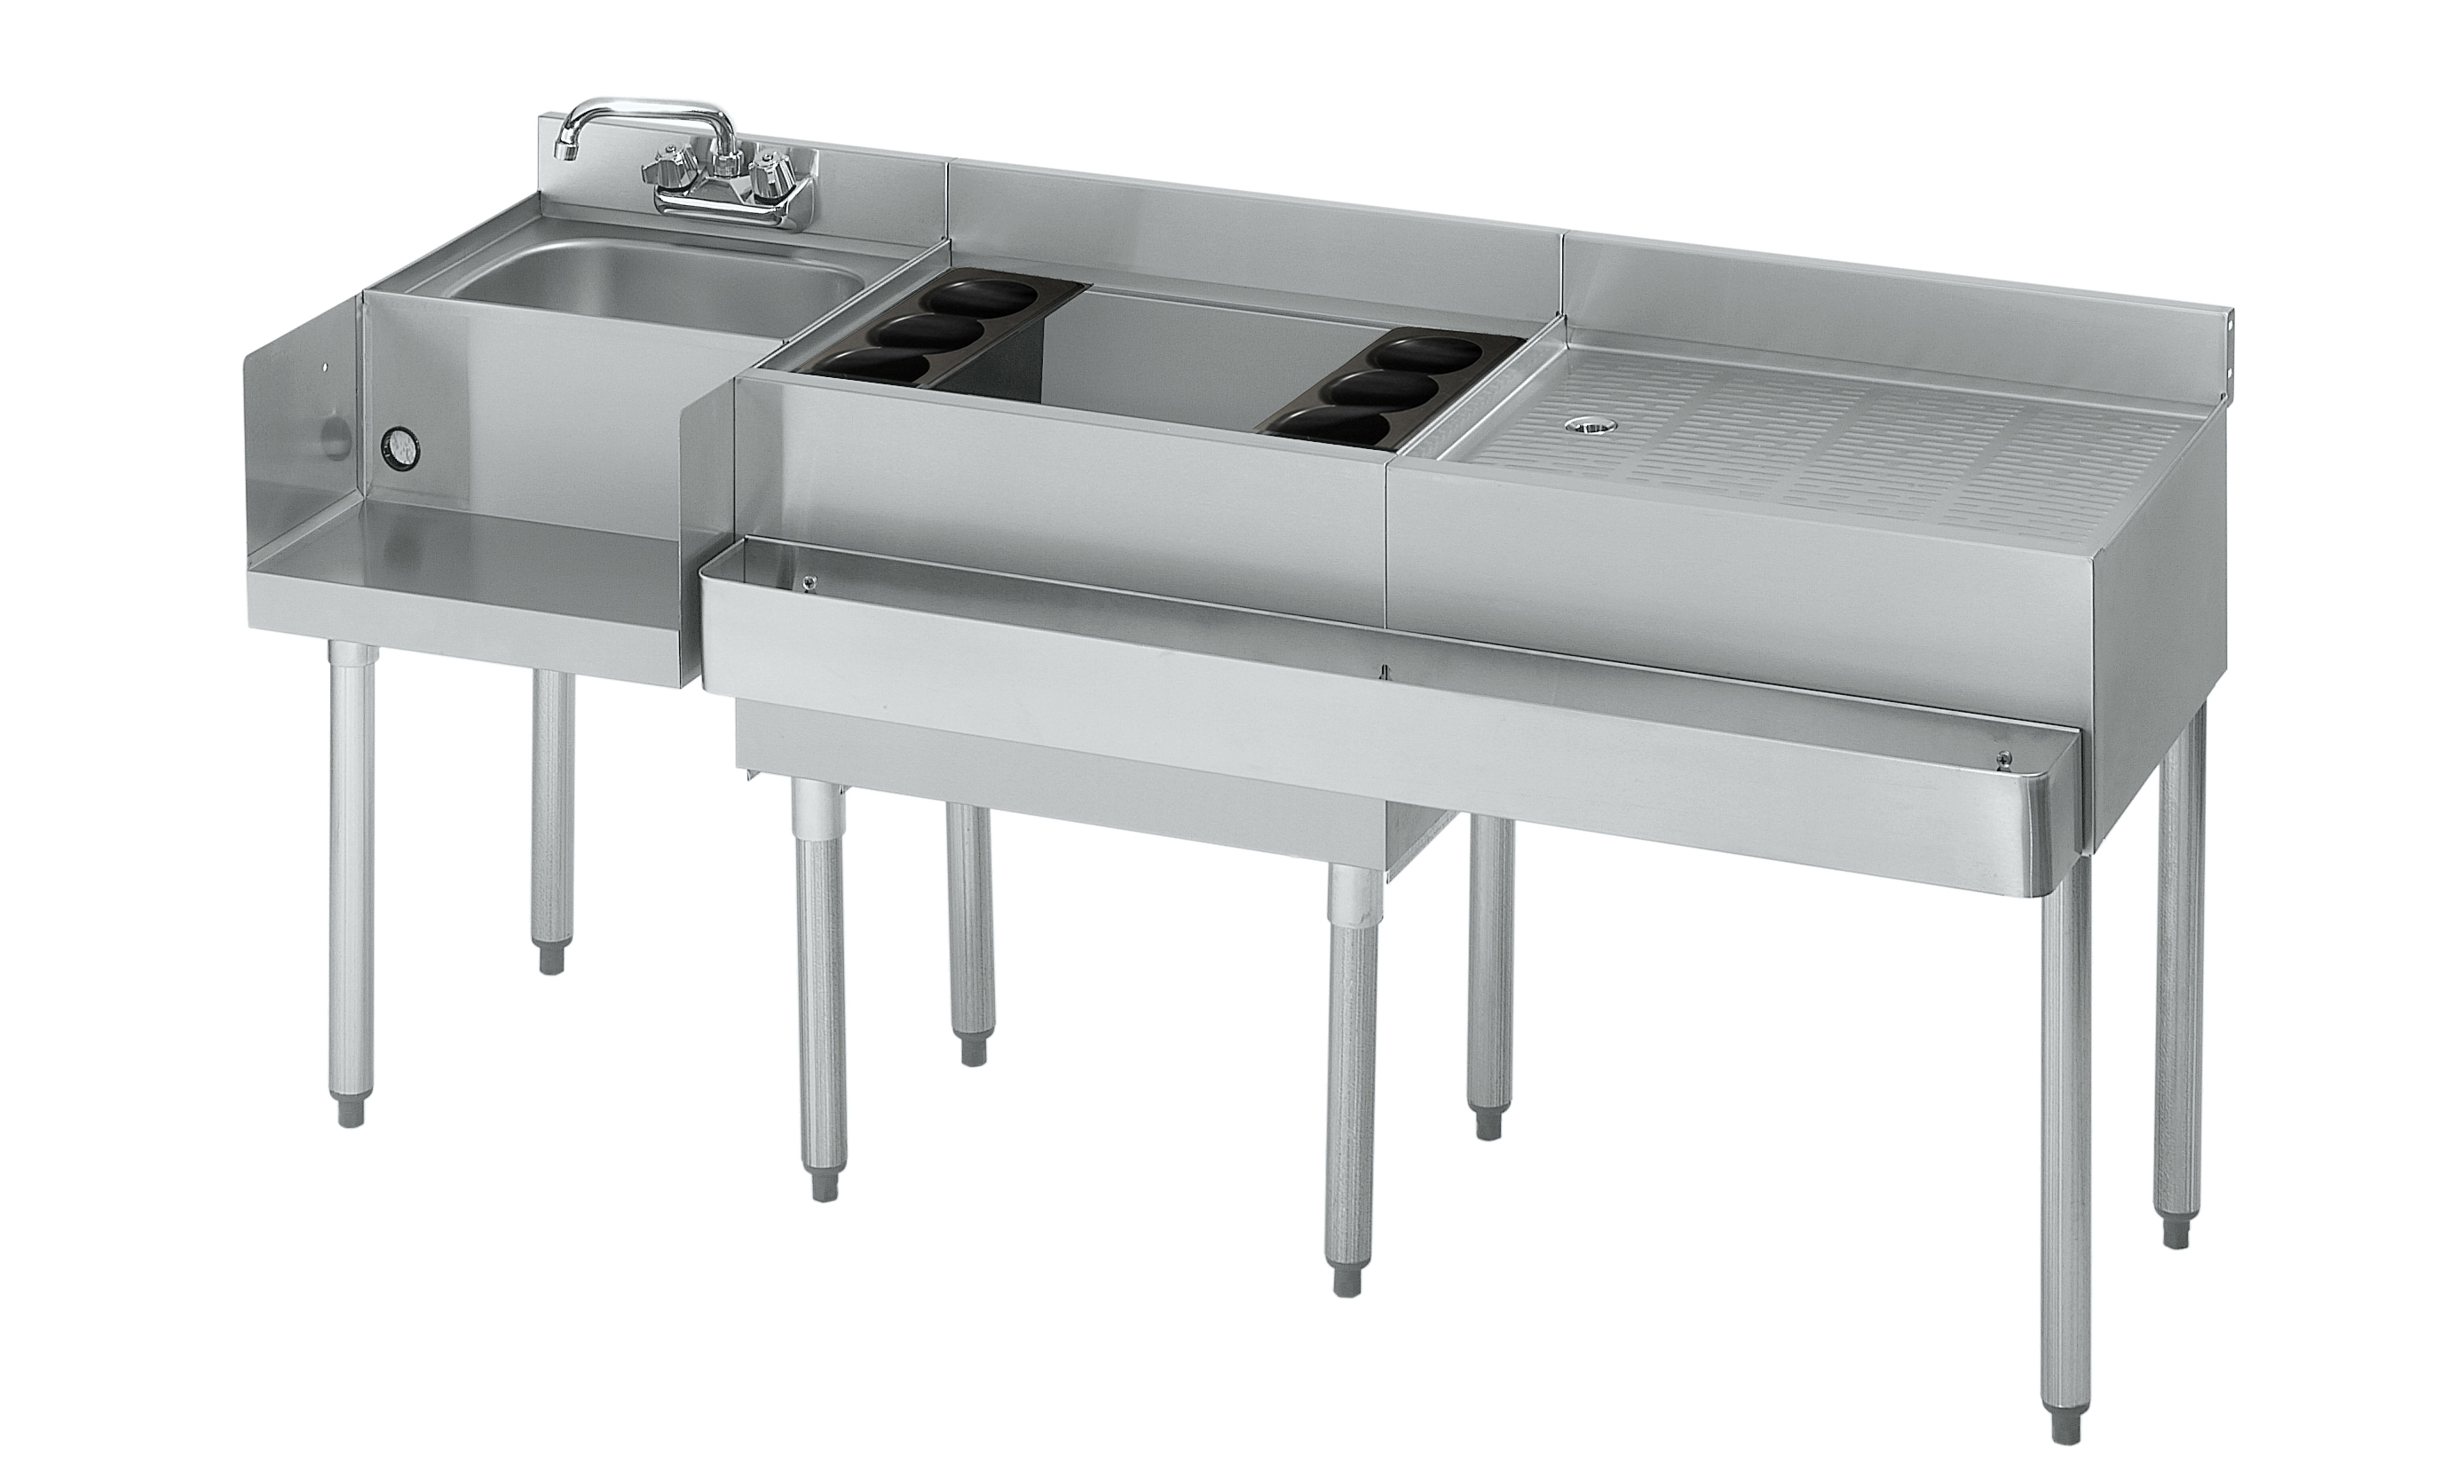 Krowne Metal 18-W66L underbar ice bin/cocktail station, blender station